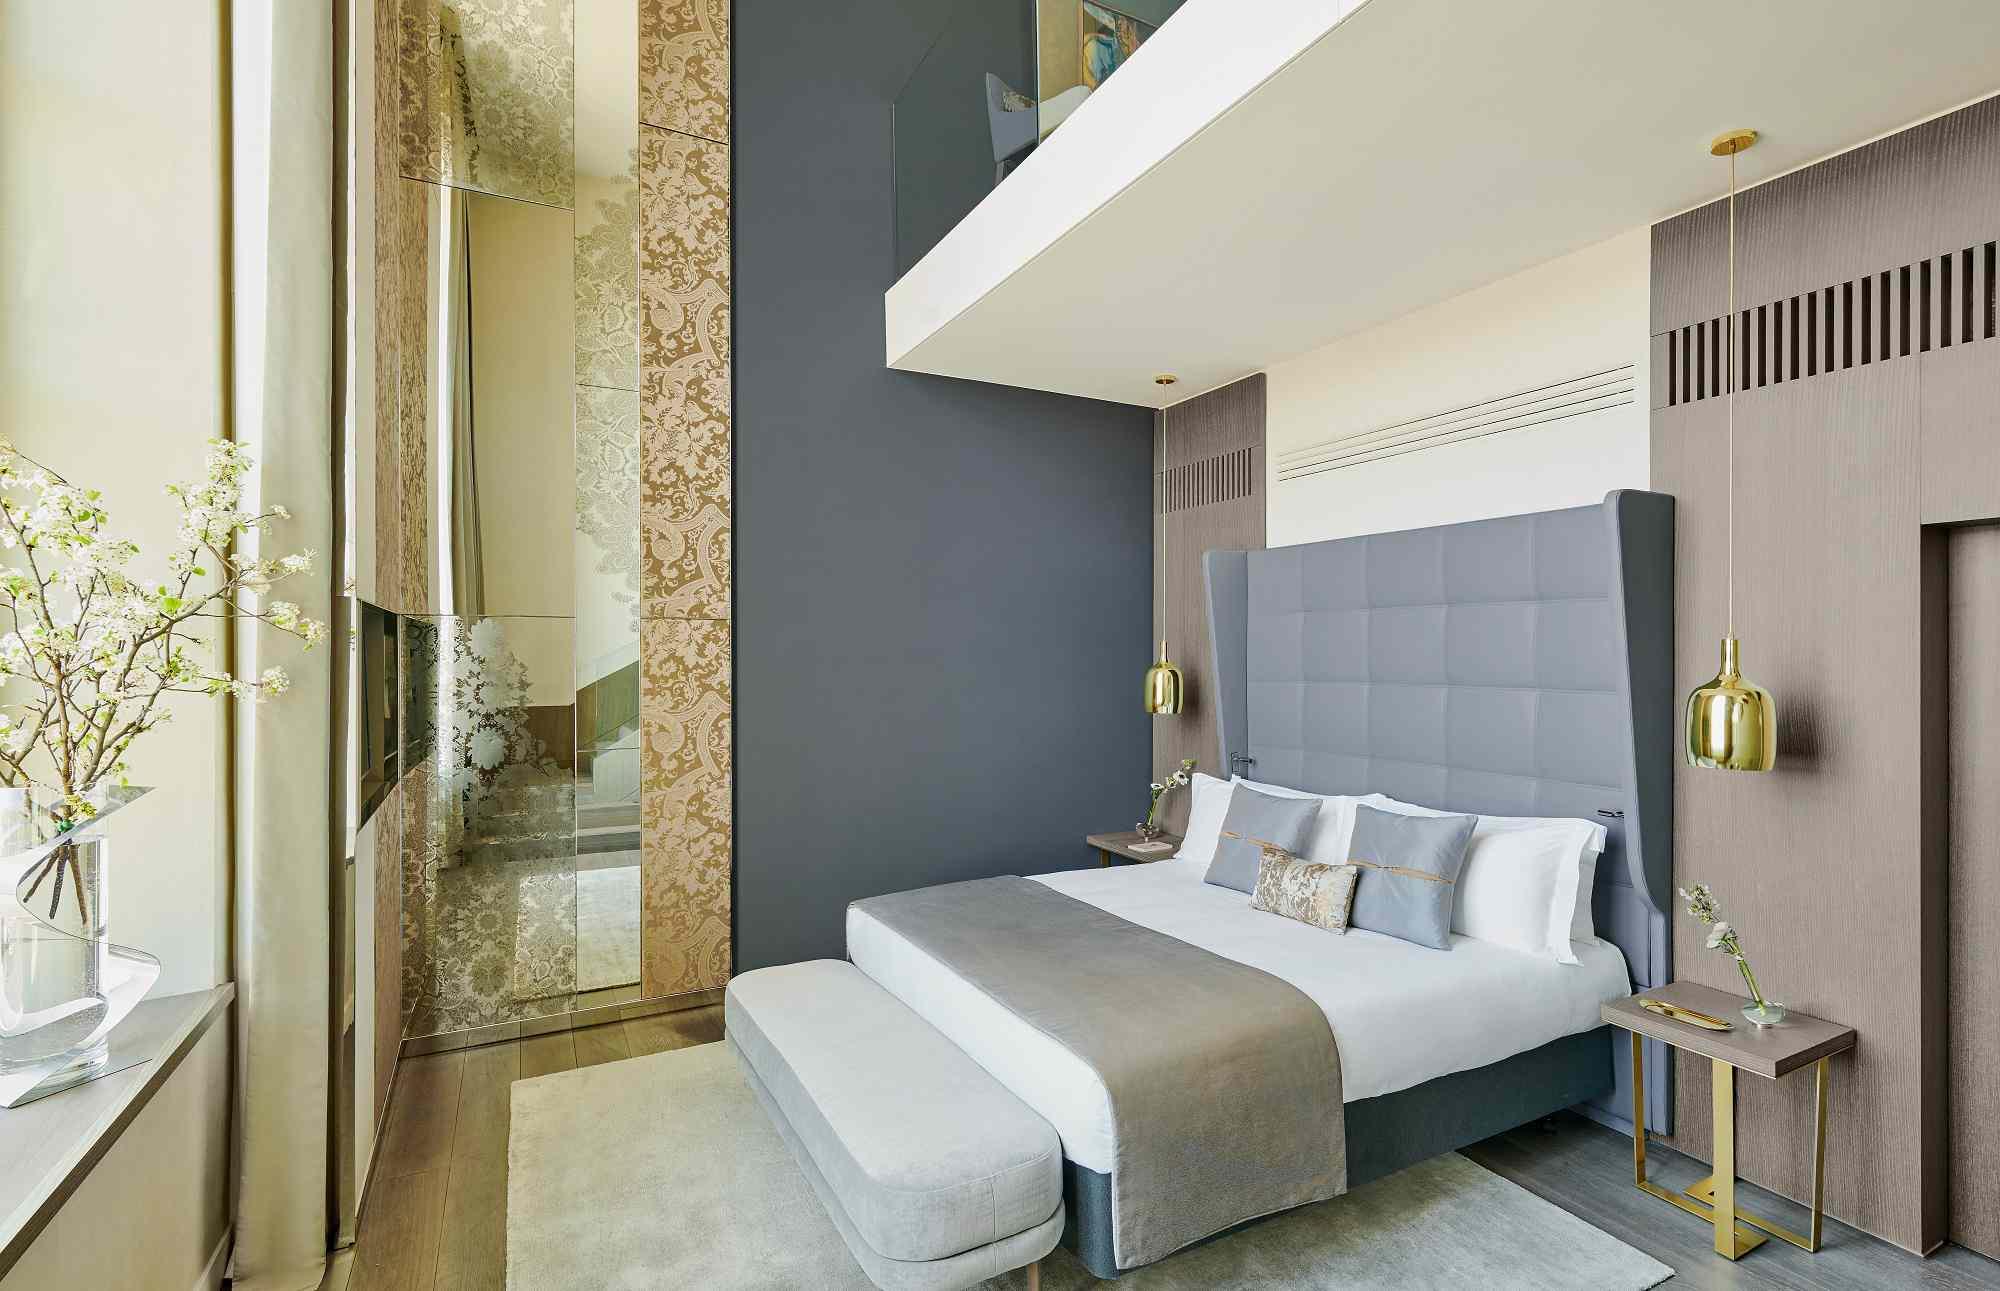 Duplex suite at the Intercontinental Lyon Hotel-Dieu Hotel